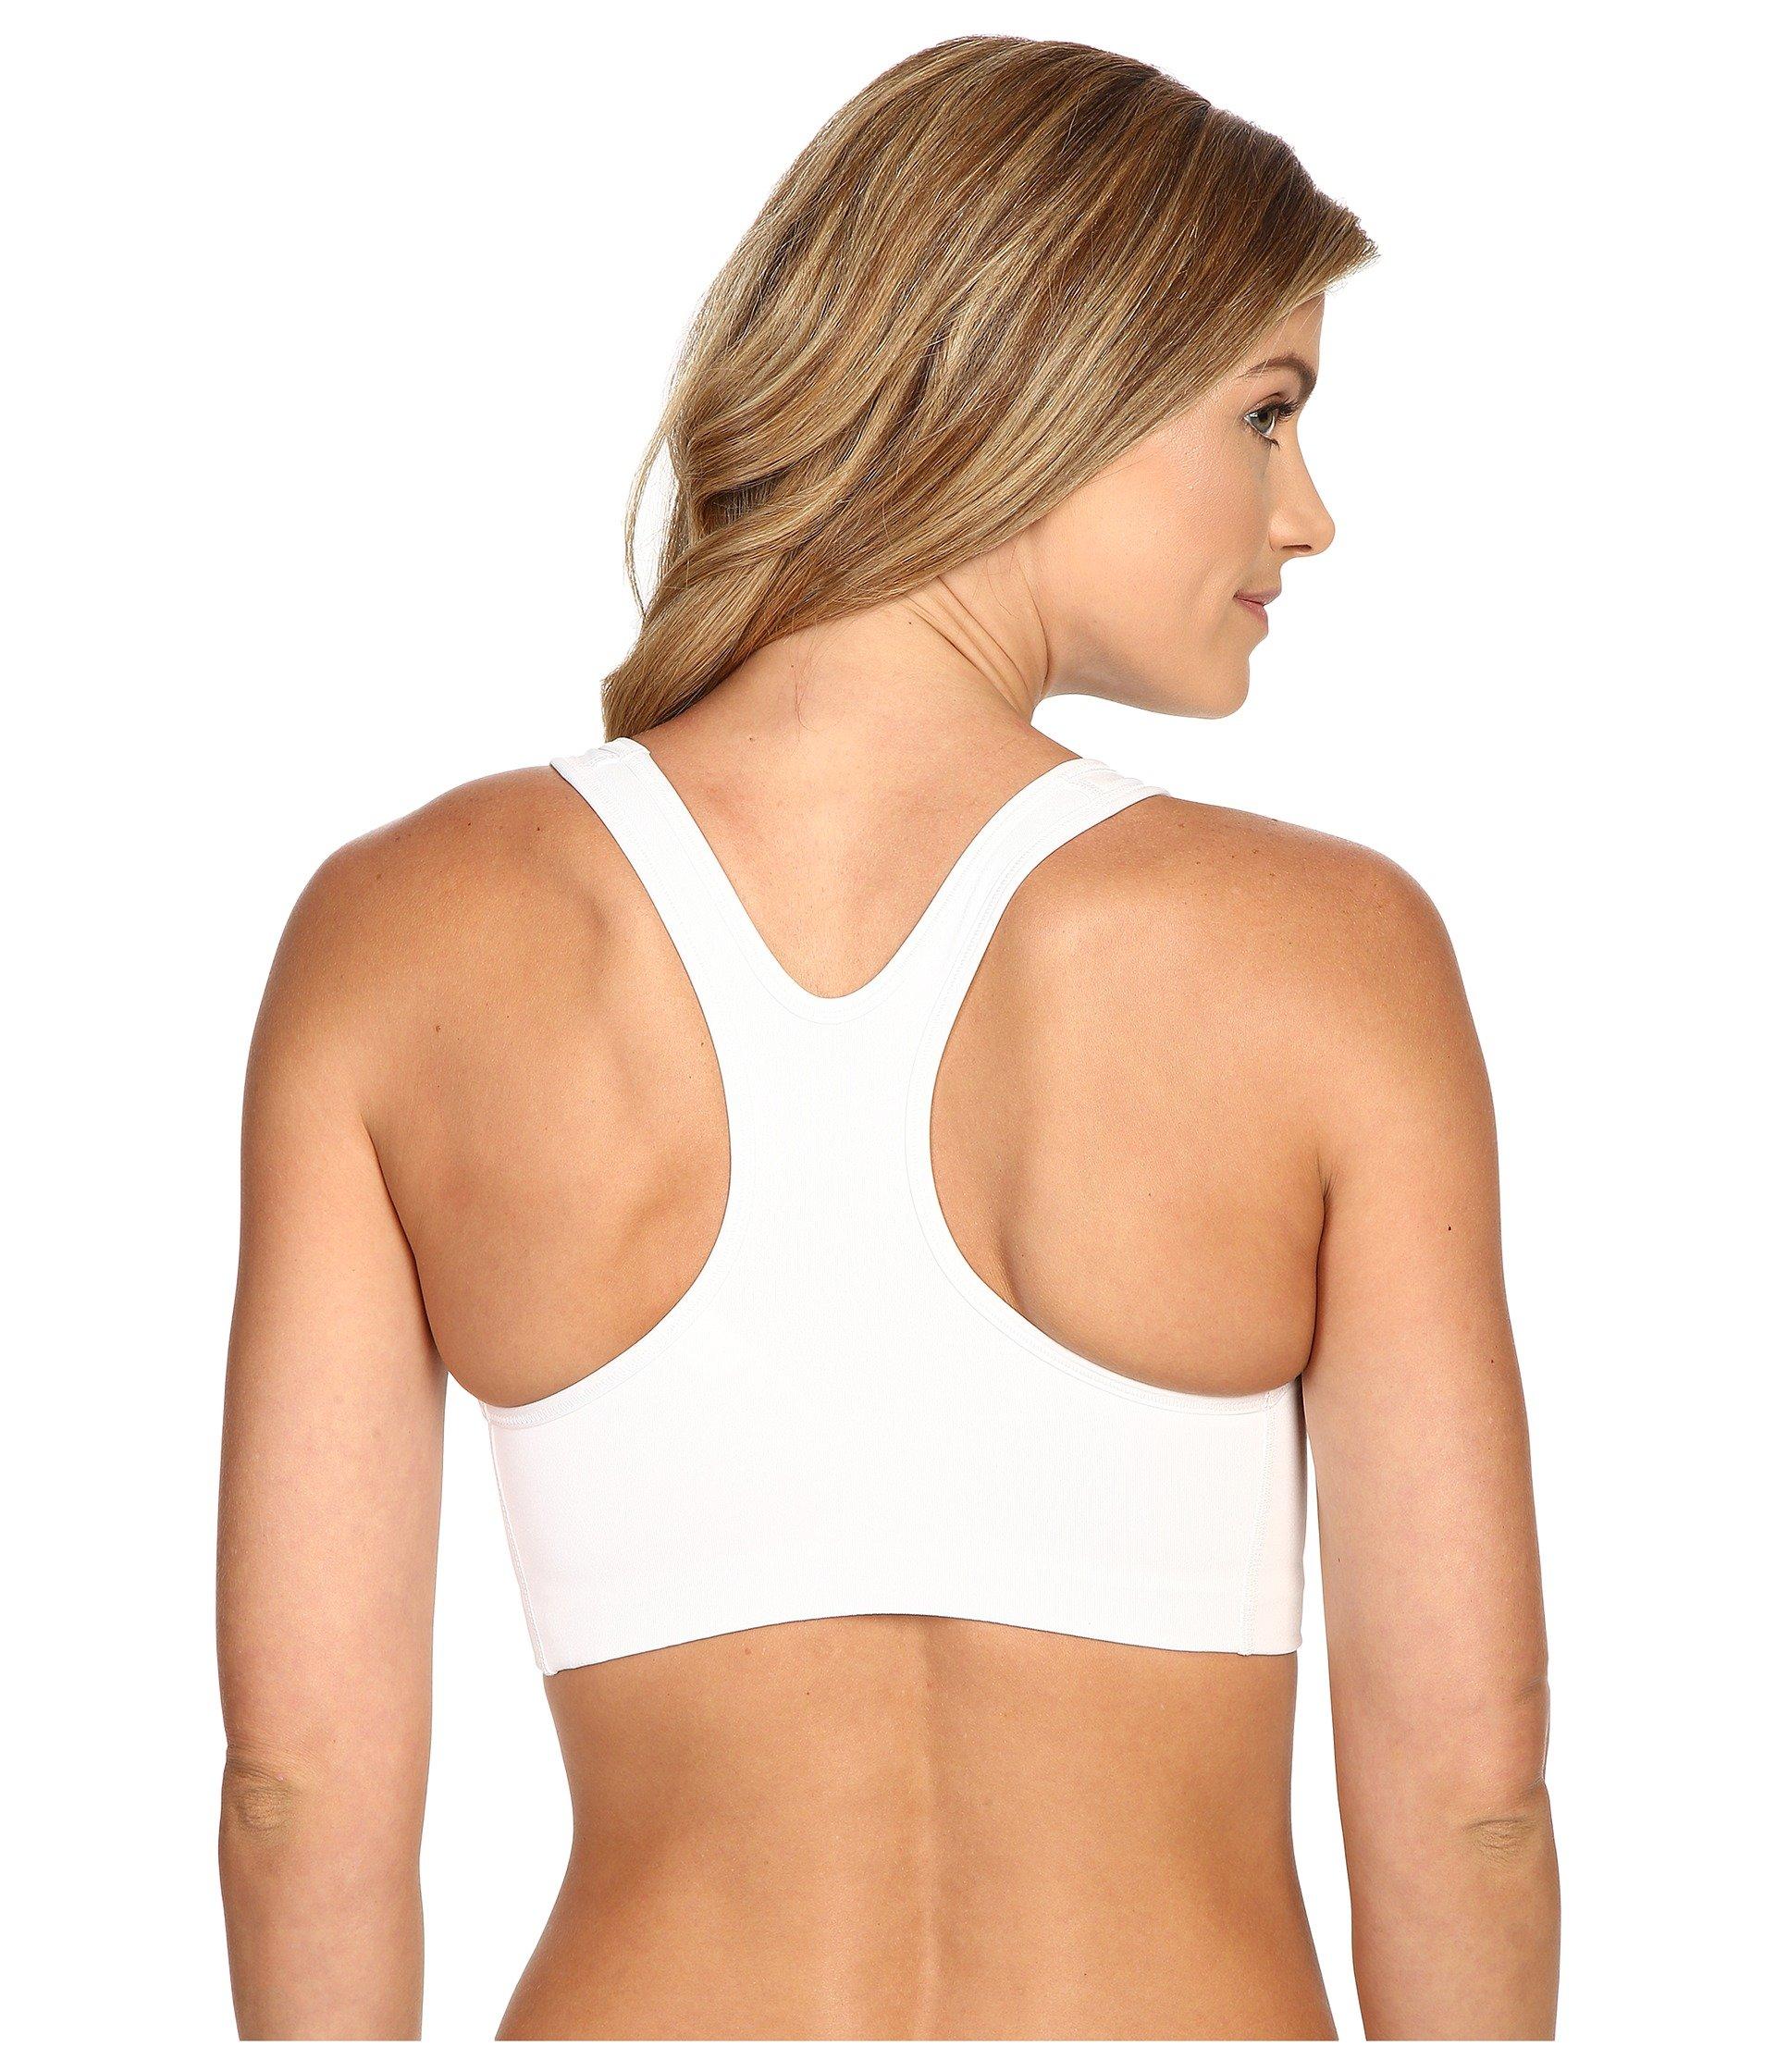 NIKE Women's Swoosh Sports Bra, White/Black, X-Small by Nike (Image #3)